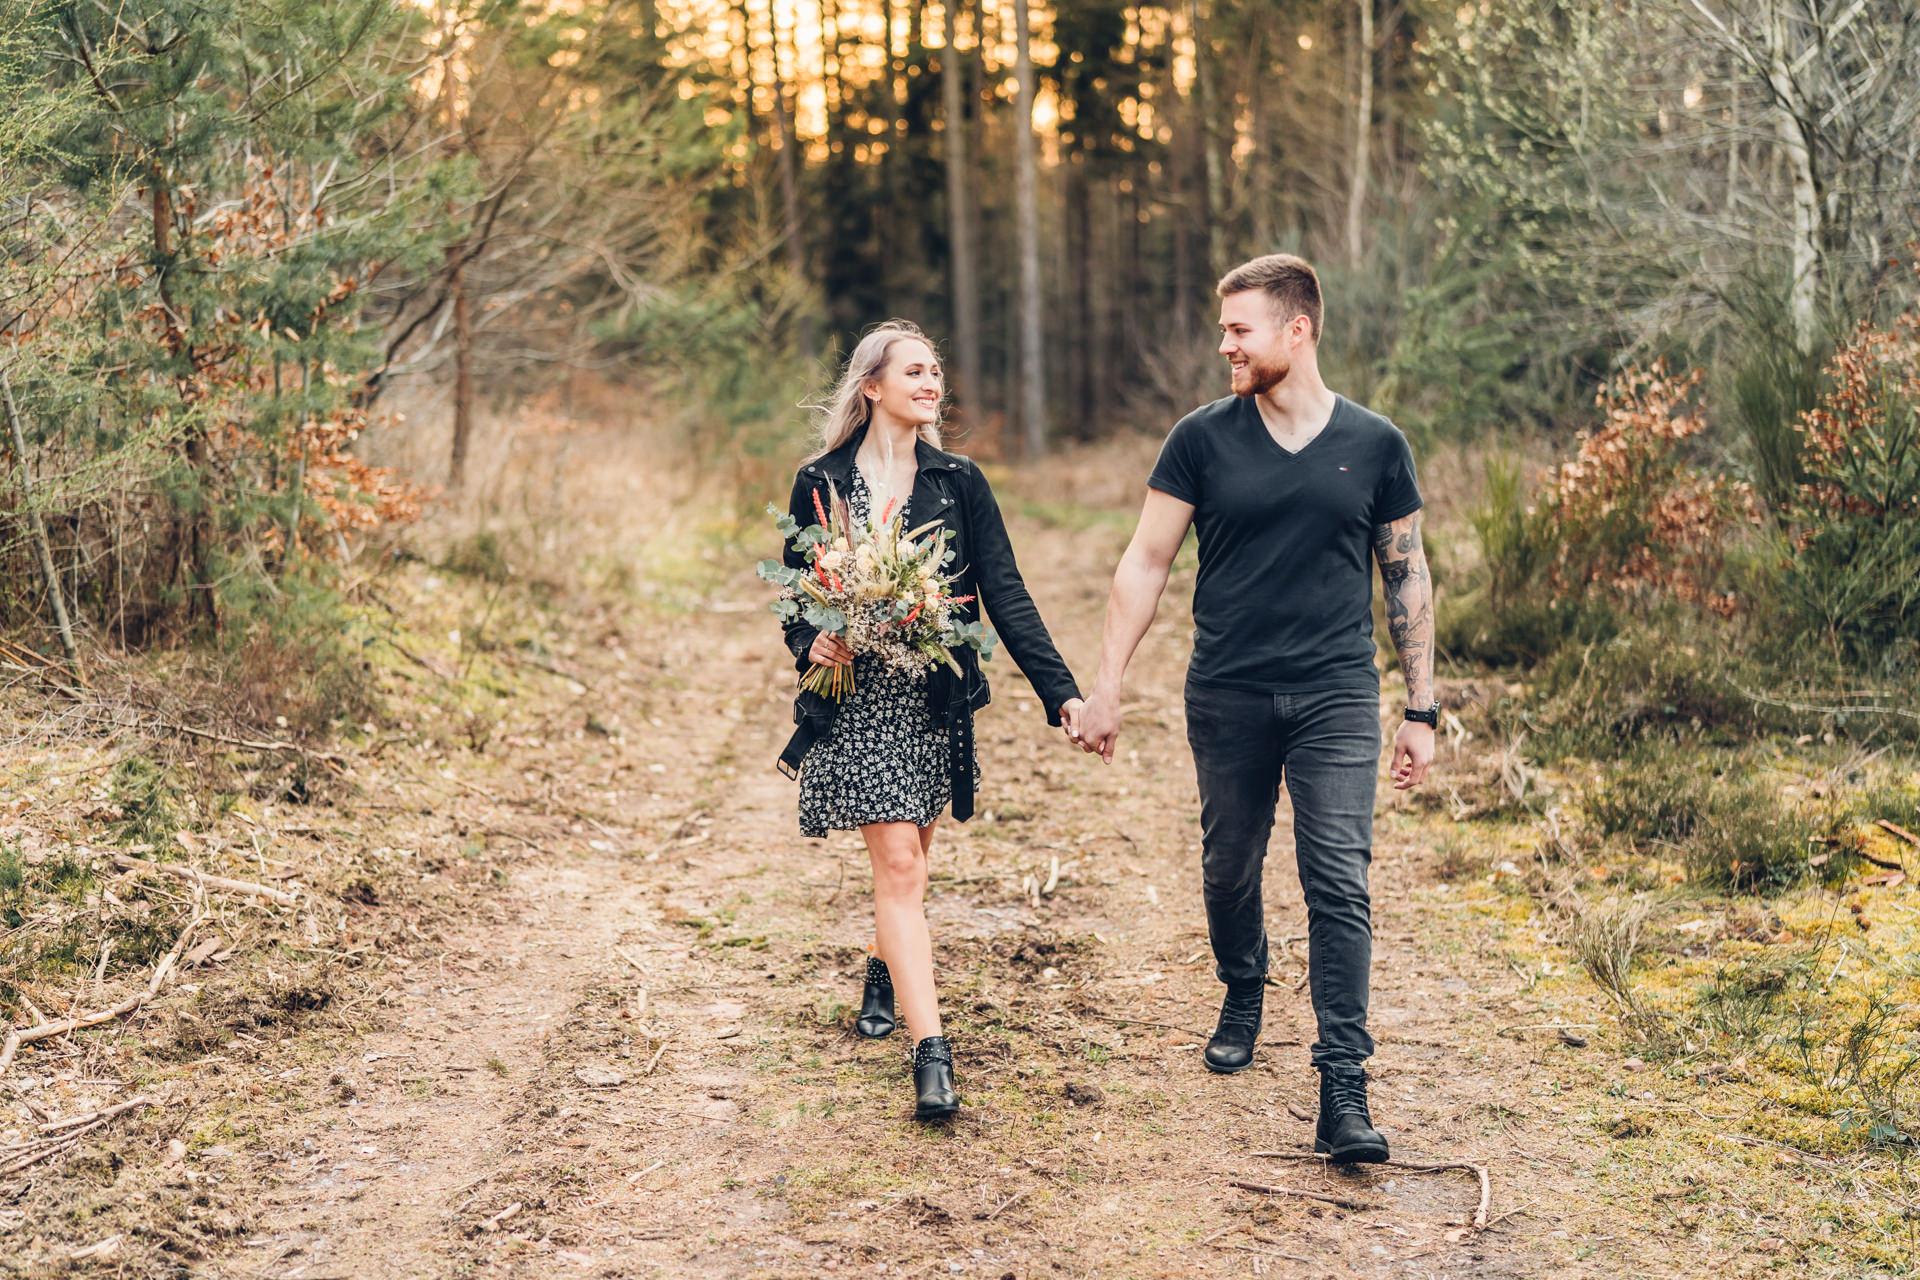 Pärchenfotos mit Oldtimern im Pfälzer Wald